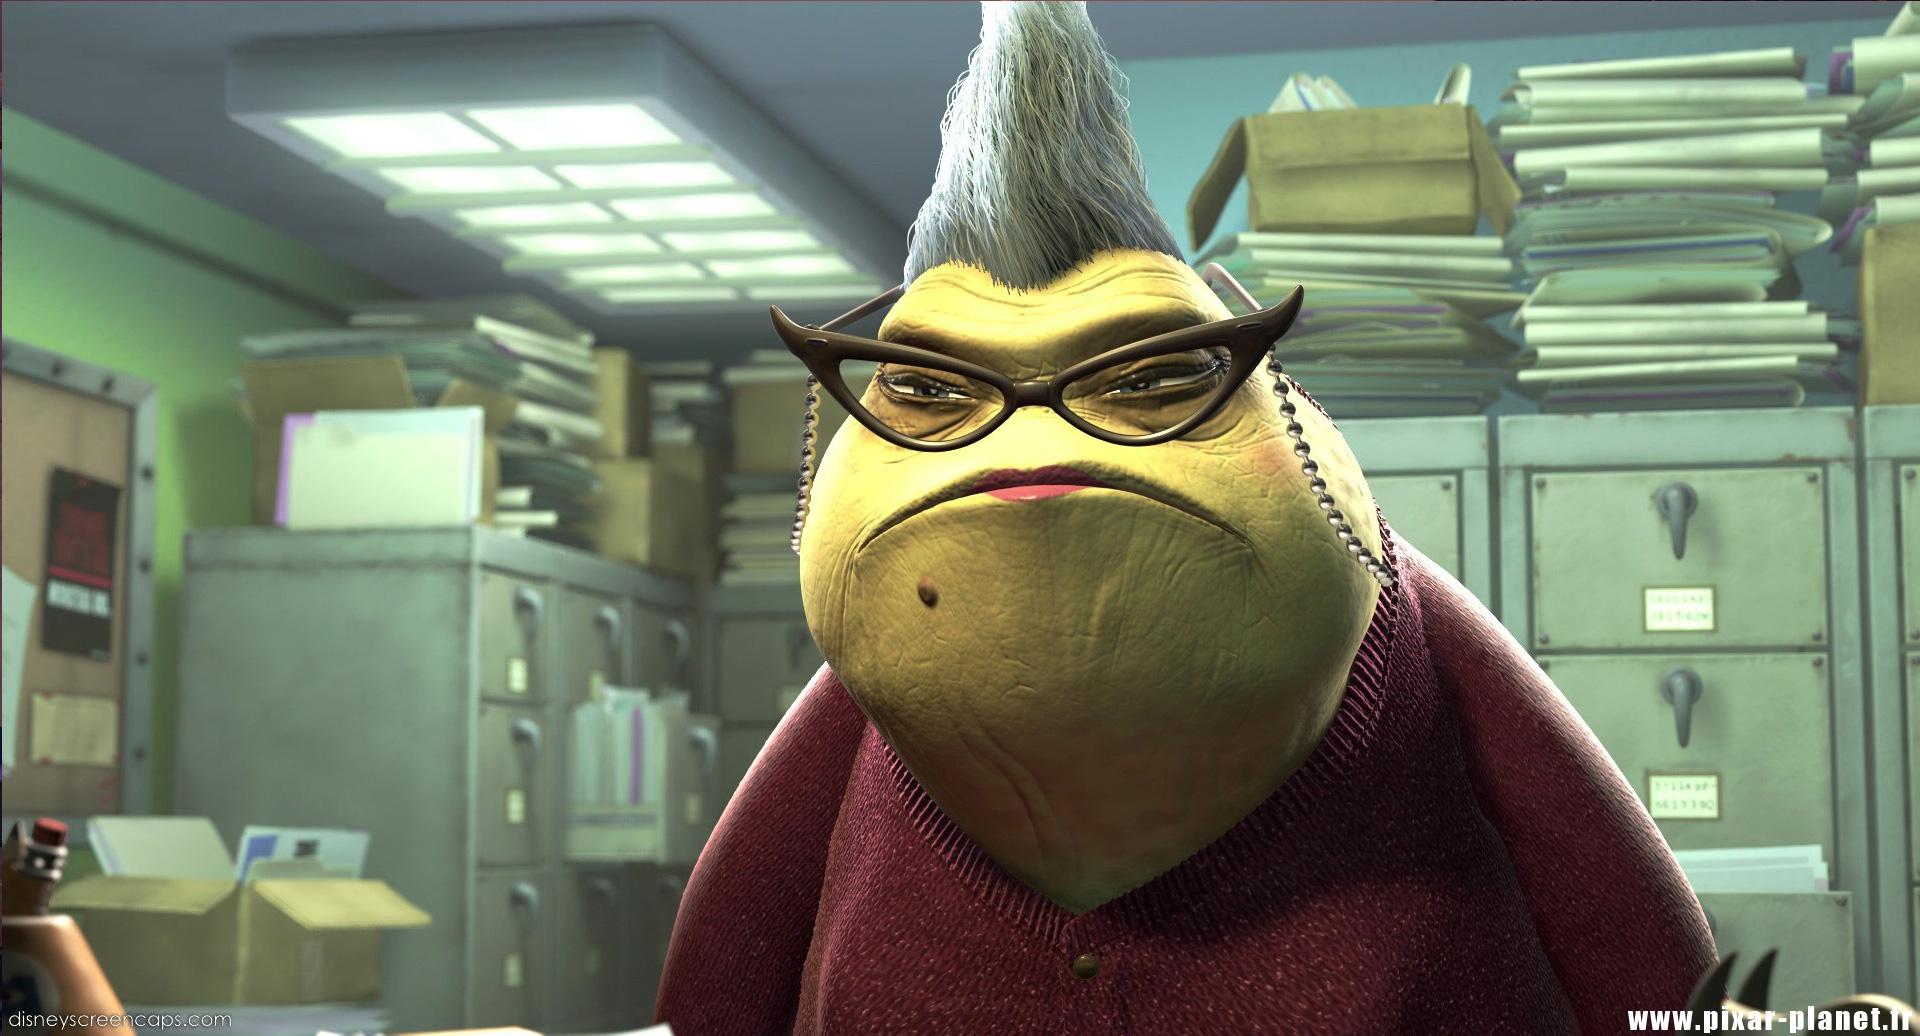 Pixar Planet Disney monstres cie monsters inc